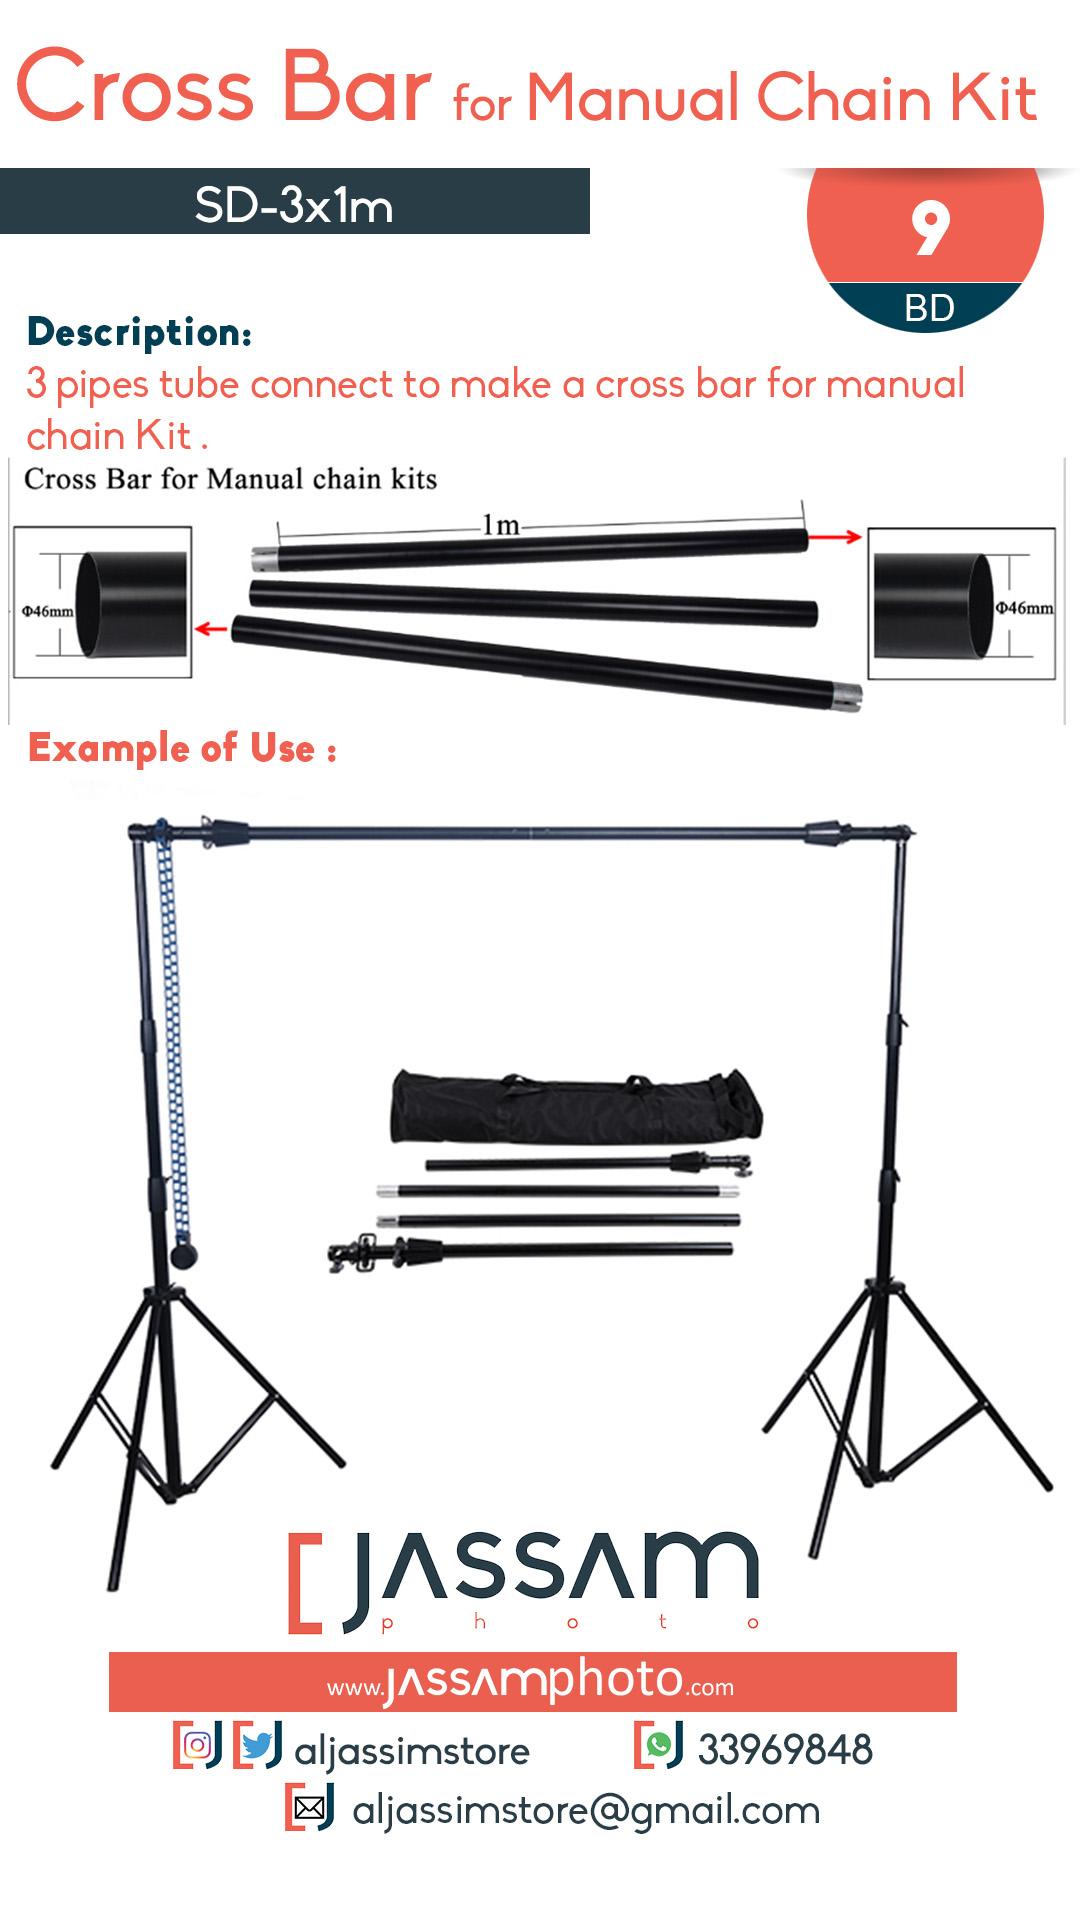 Cross Bar for Manual Chain